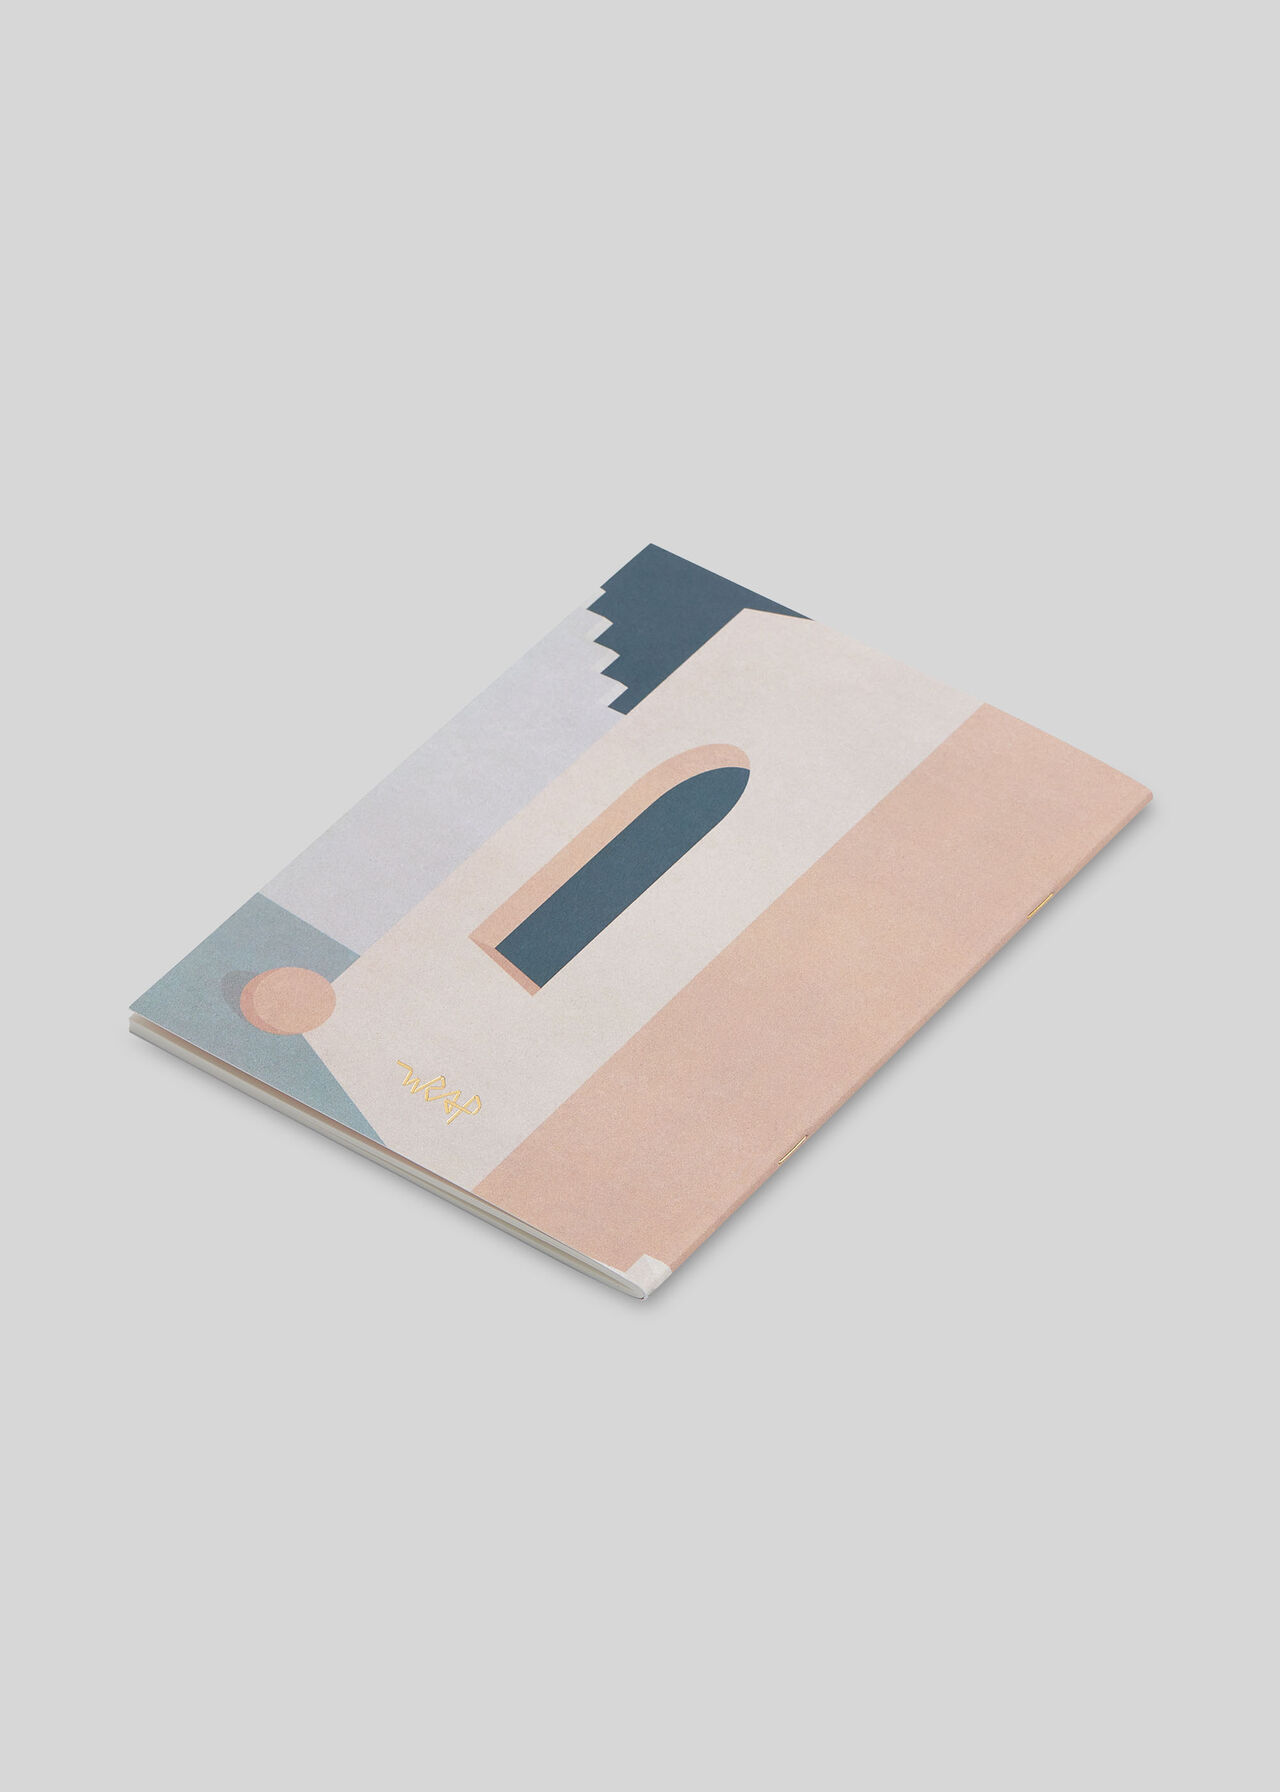 Wrap Pastel Doorway Notebook Multicolour